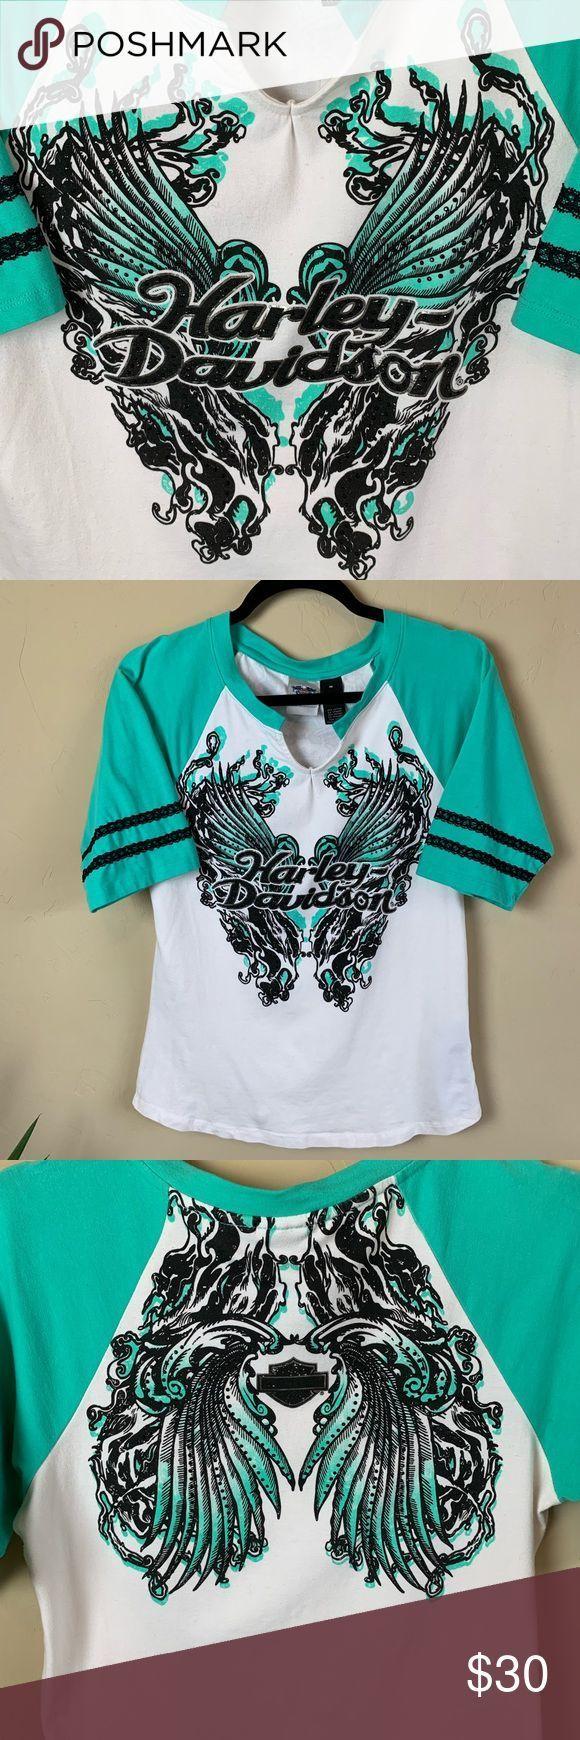 #angel  #HarleyDavidson  #Ra  #Raglan  #size  #TShirt  #Wings #Angel #Wings  Harley-Davidson Angel Wings Raglan T-Shirt Size M Harley-Davidson Angel Wings Ra...